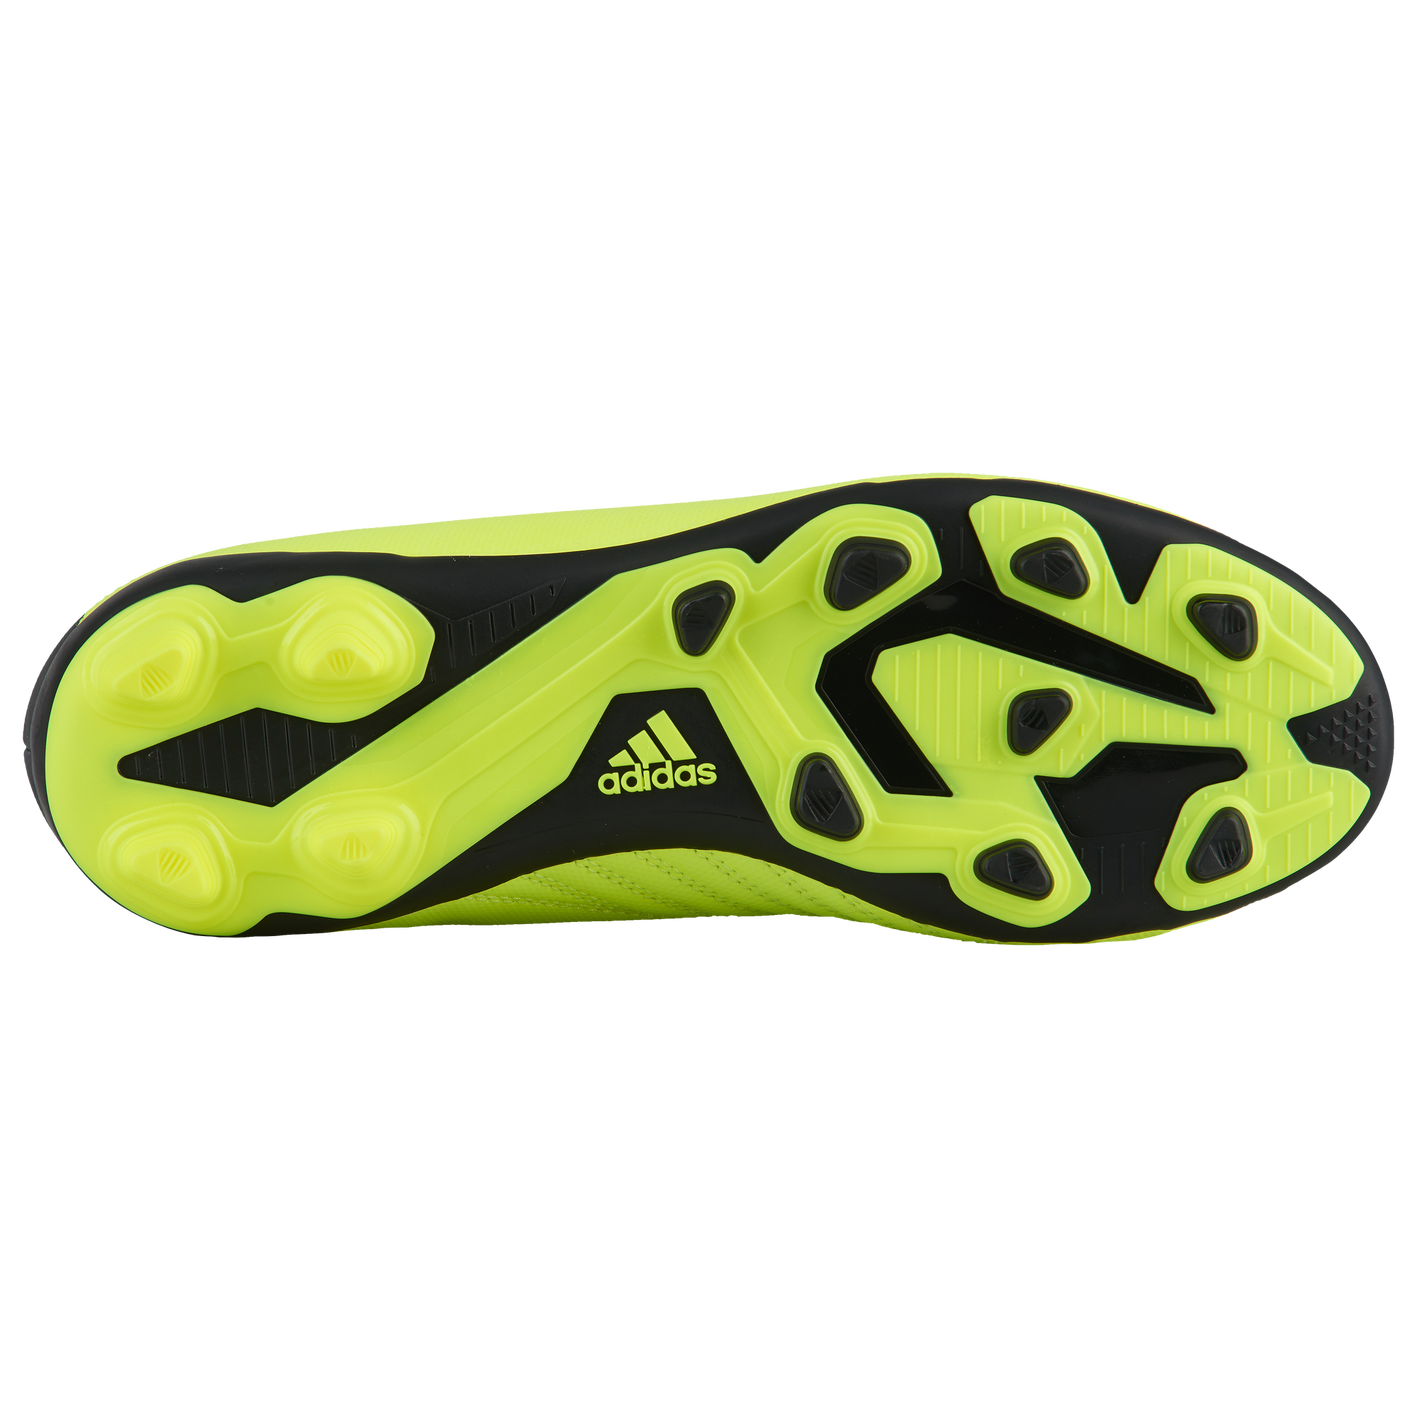 07a43d01d adidas X 18.4 FG - Boys' Grade School - Soccer - Shoes - Solar ...